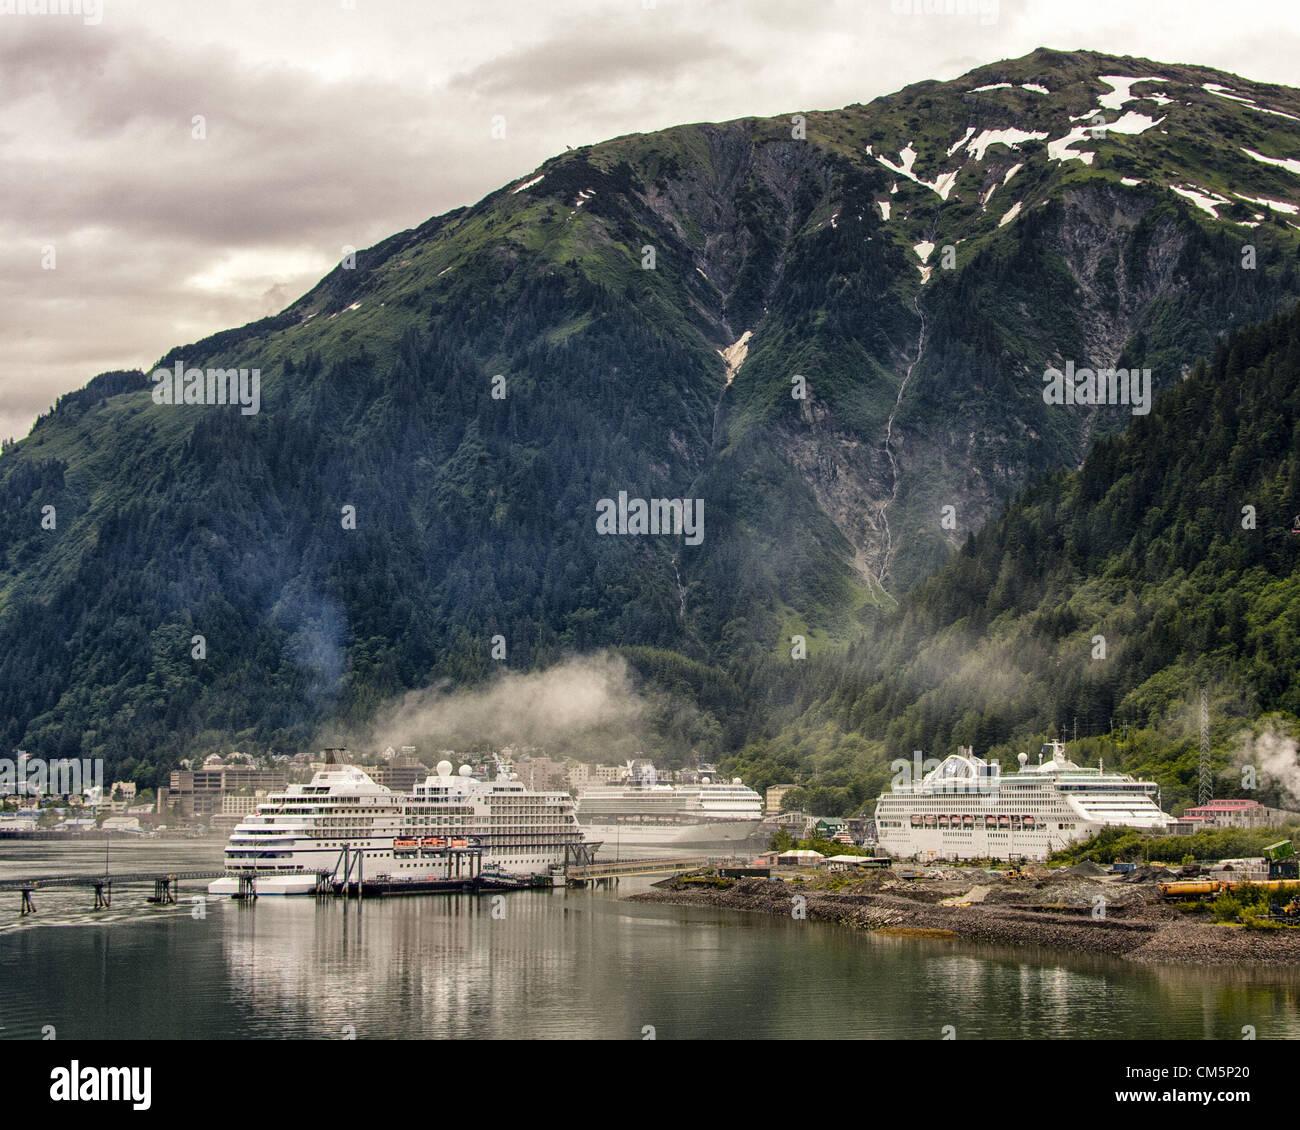 July 5, 2012 - The Regent Seven Seas Navigator, Celebrity Century and the Princess Cruises Sea Princess, l. to r., - Stock Image